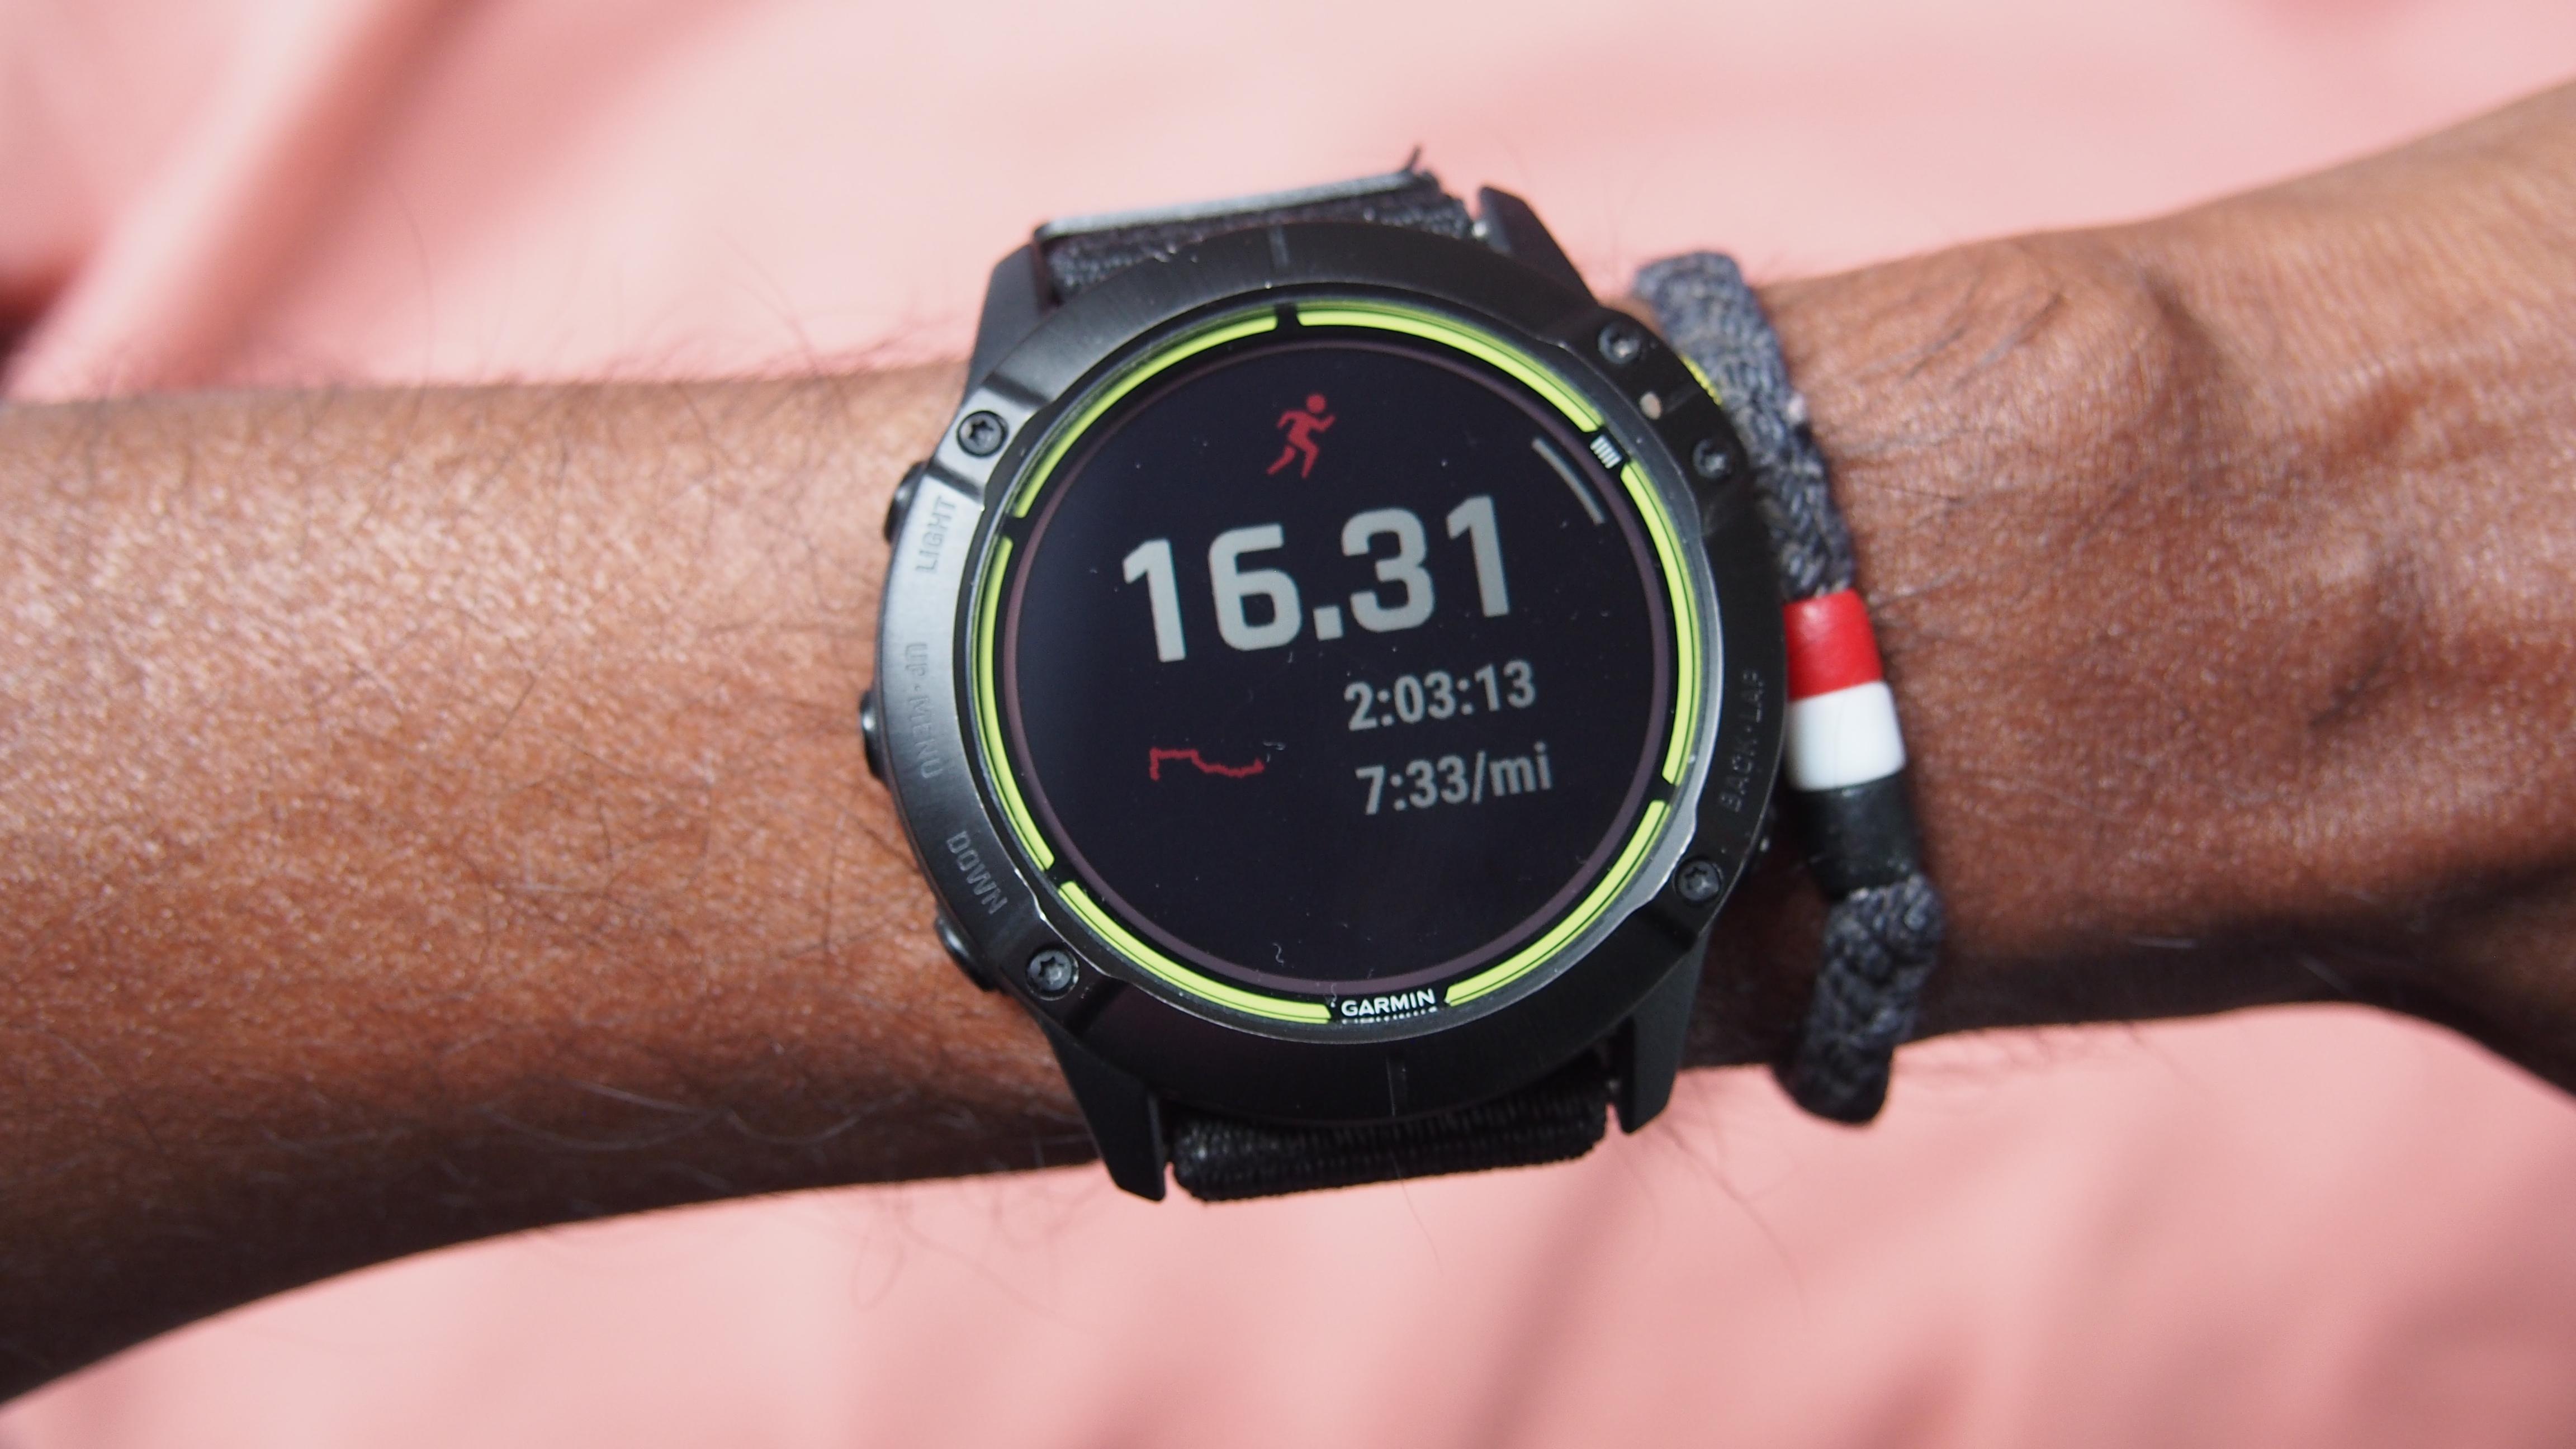 Garmin Enduro on man's wrist, showing post-workout data